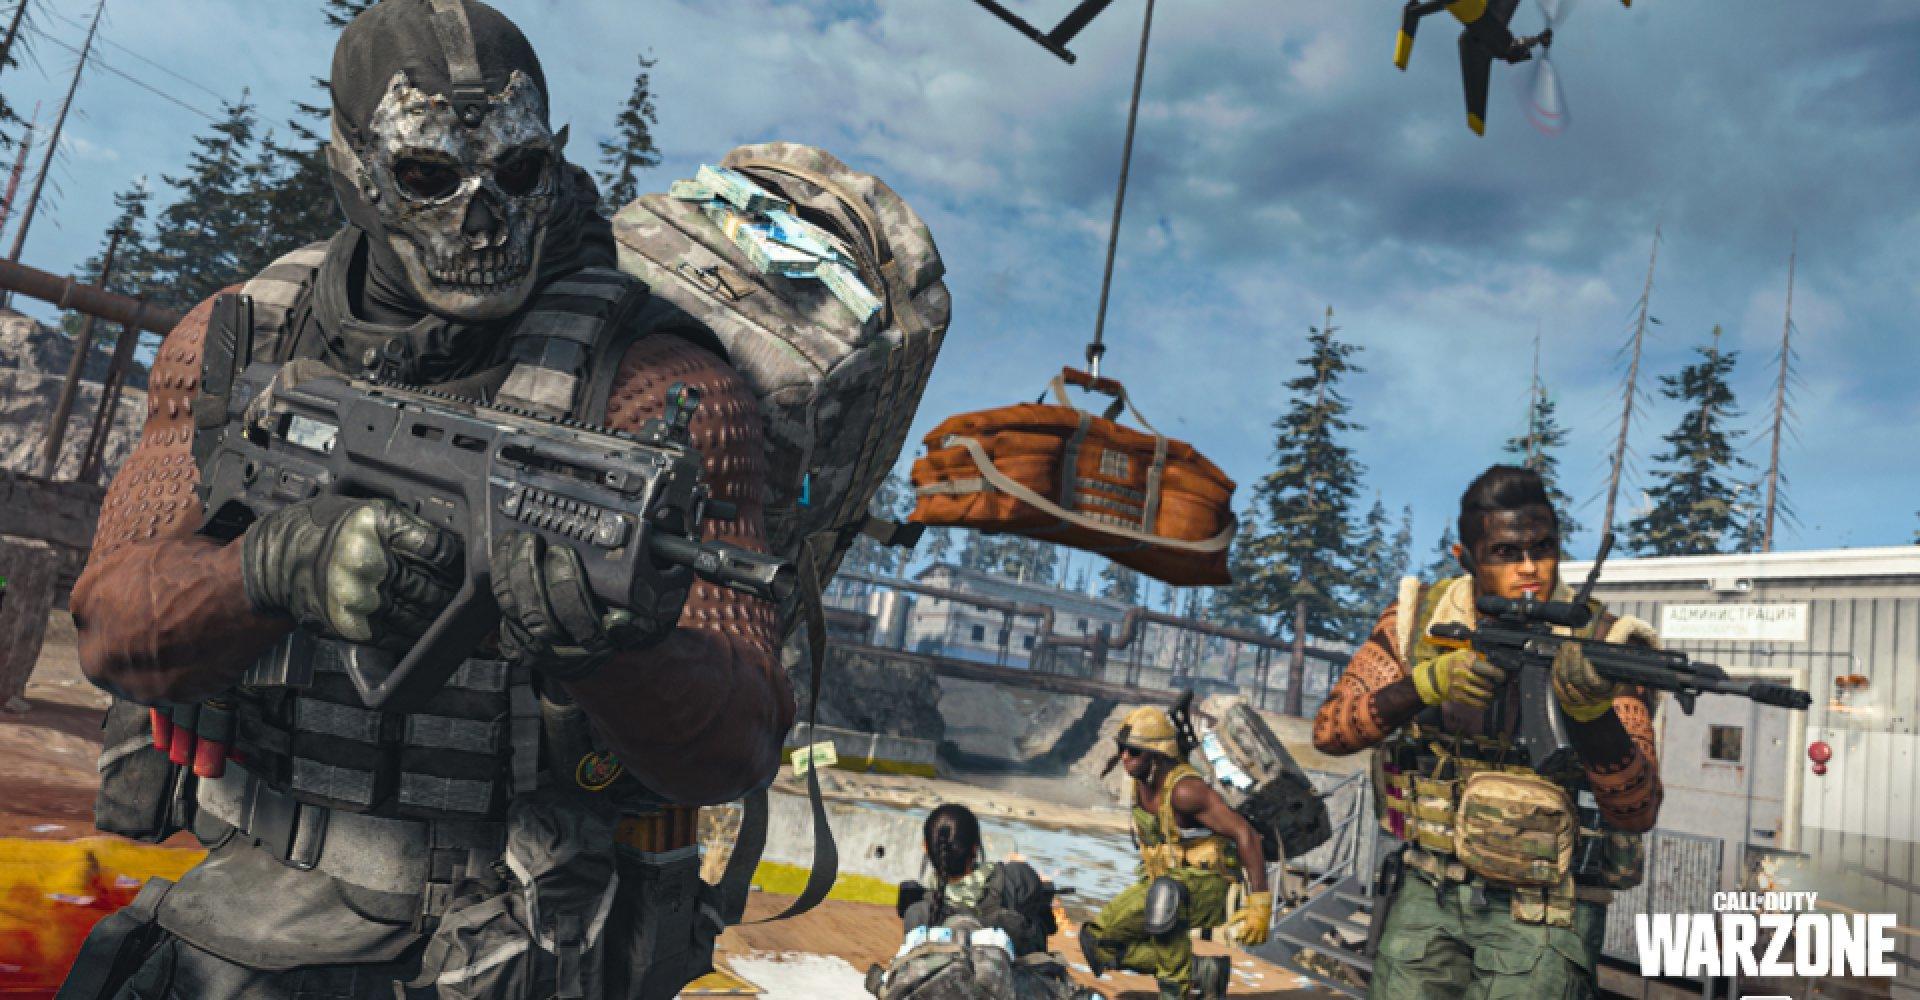 Warzone rammer 6 millioner spillere på 24...